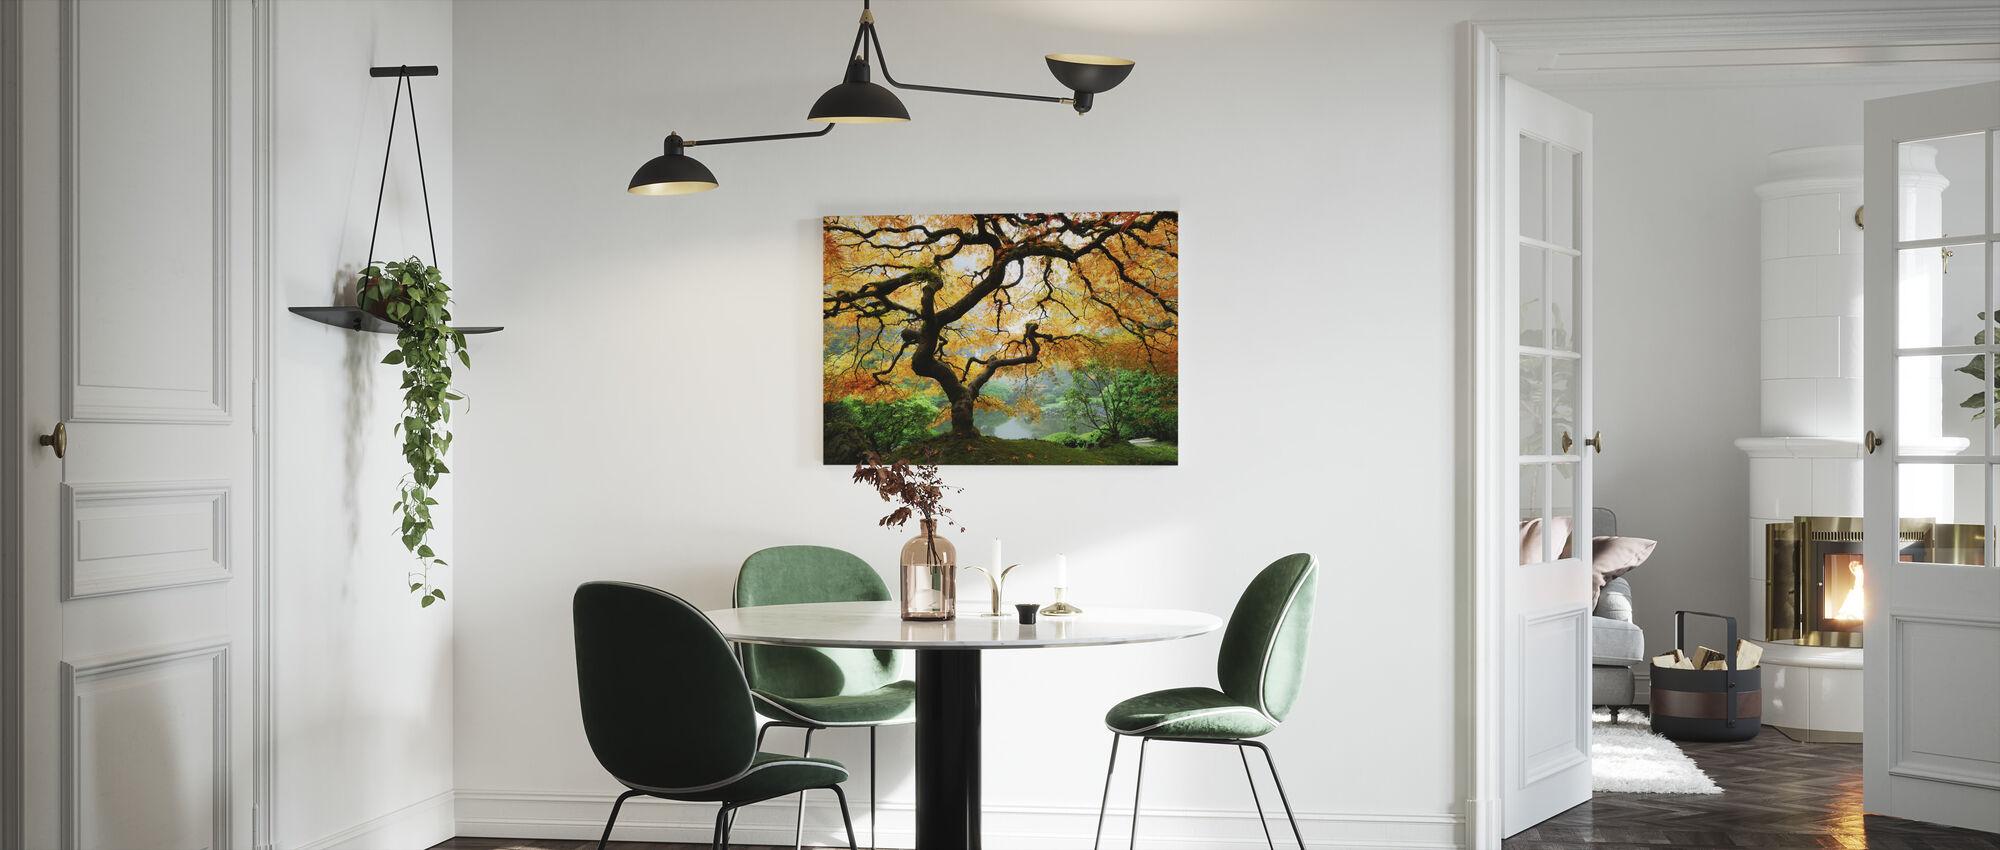 Herbst Ahorn - Leinwandbild - Küchen